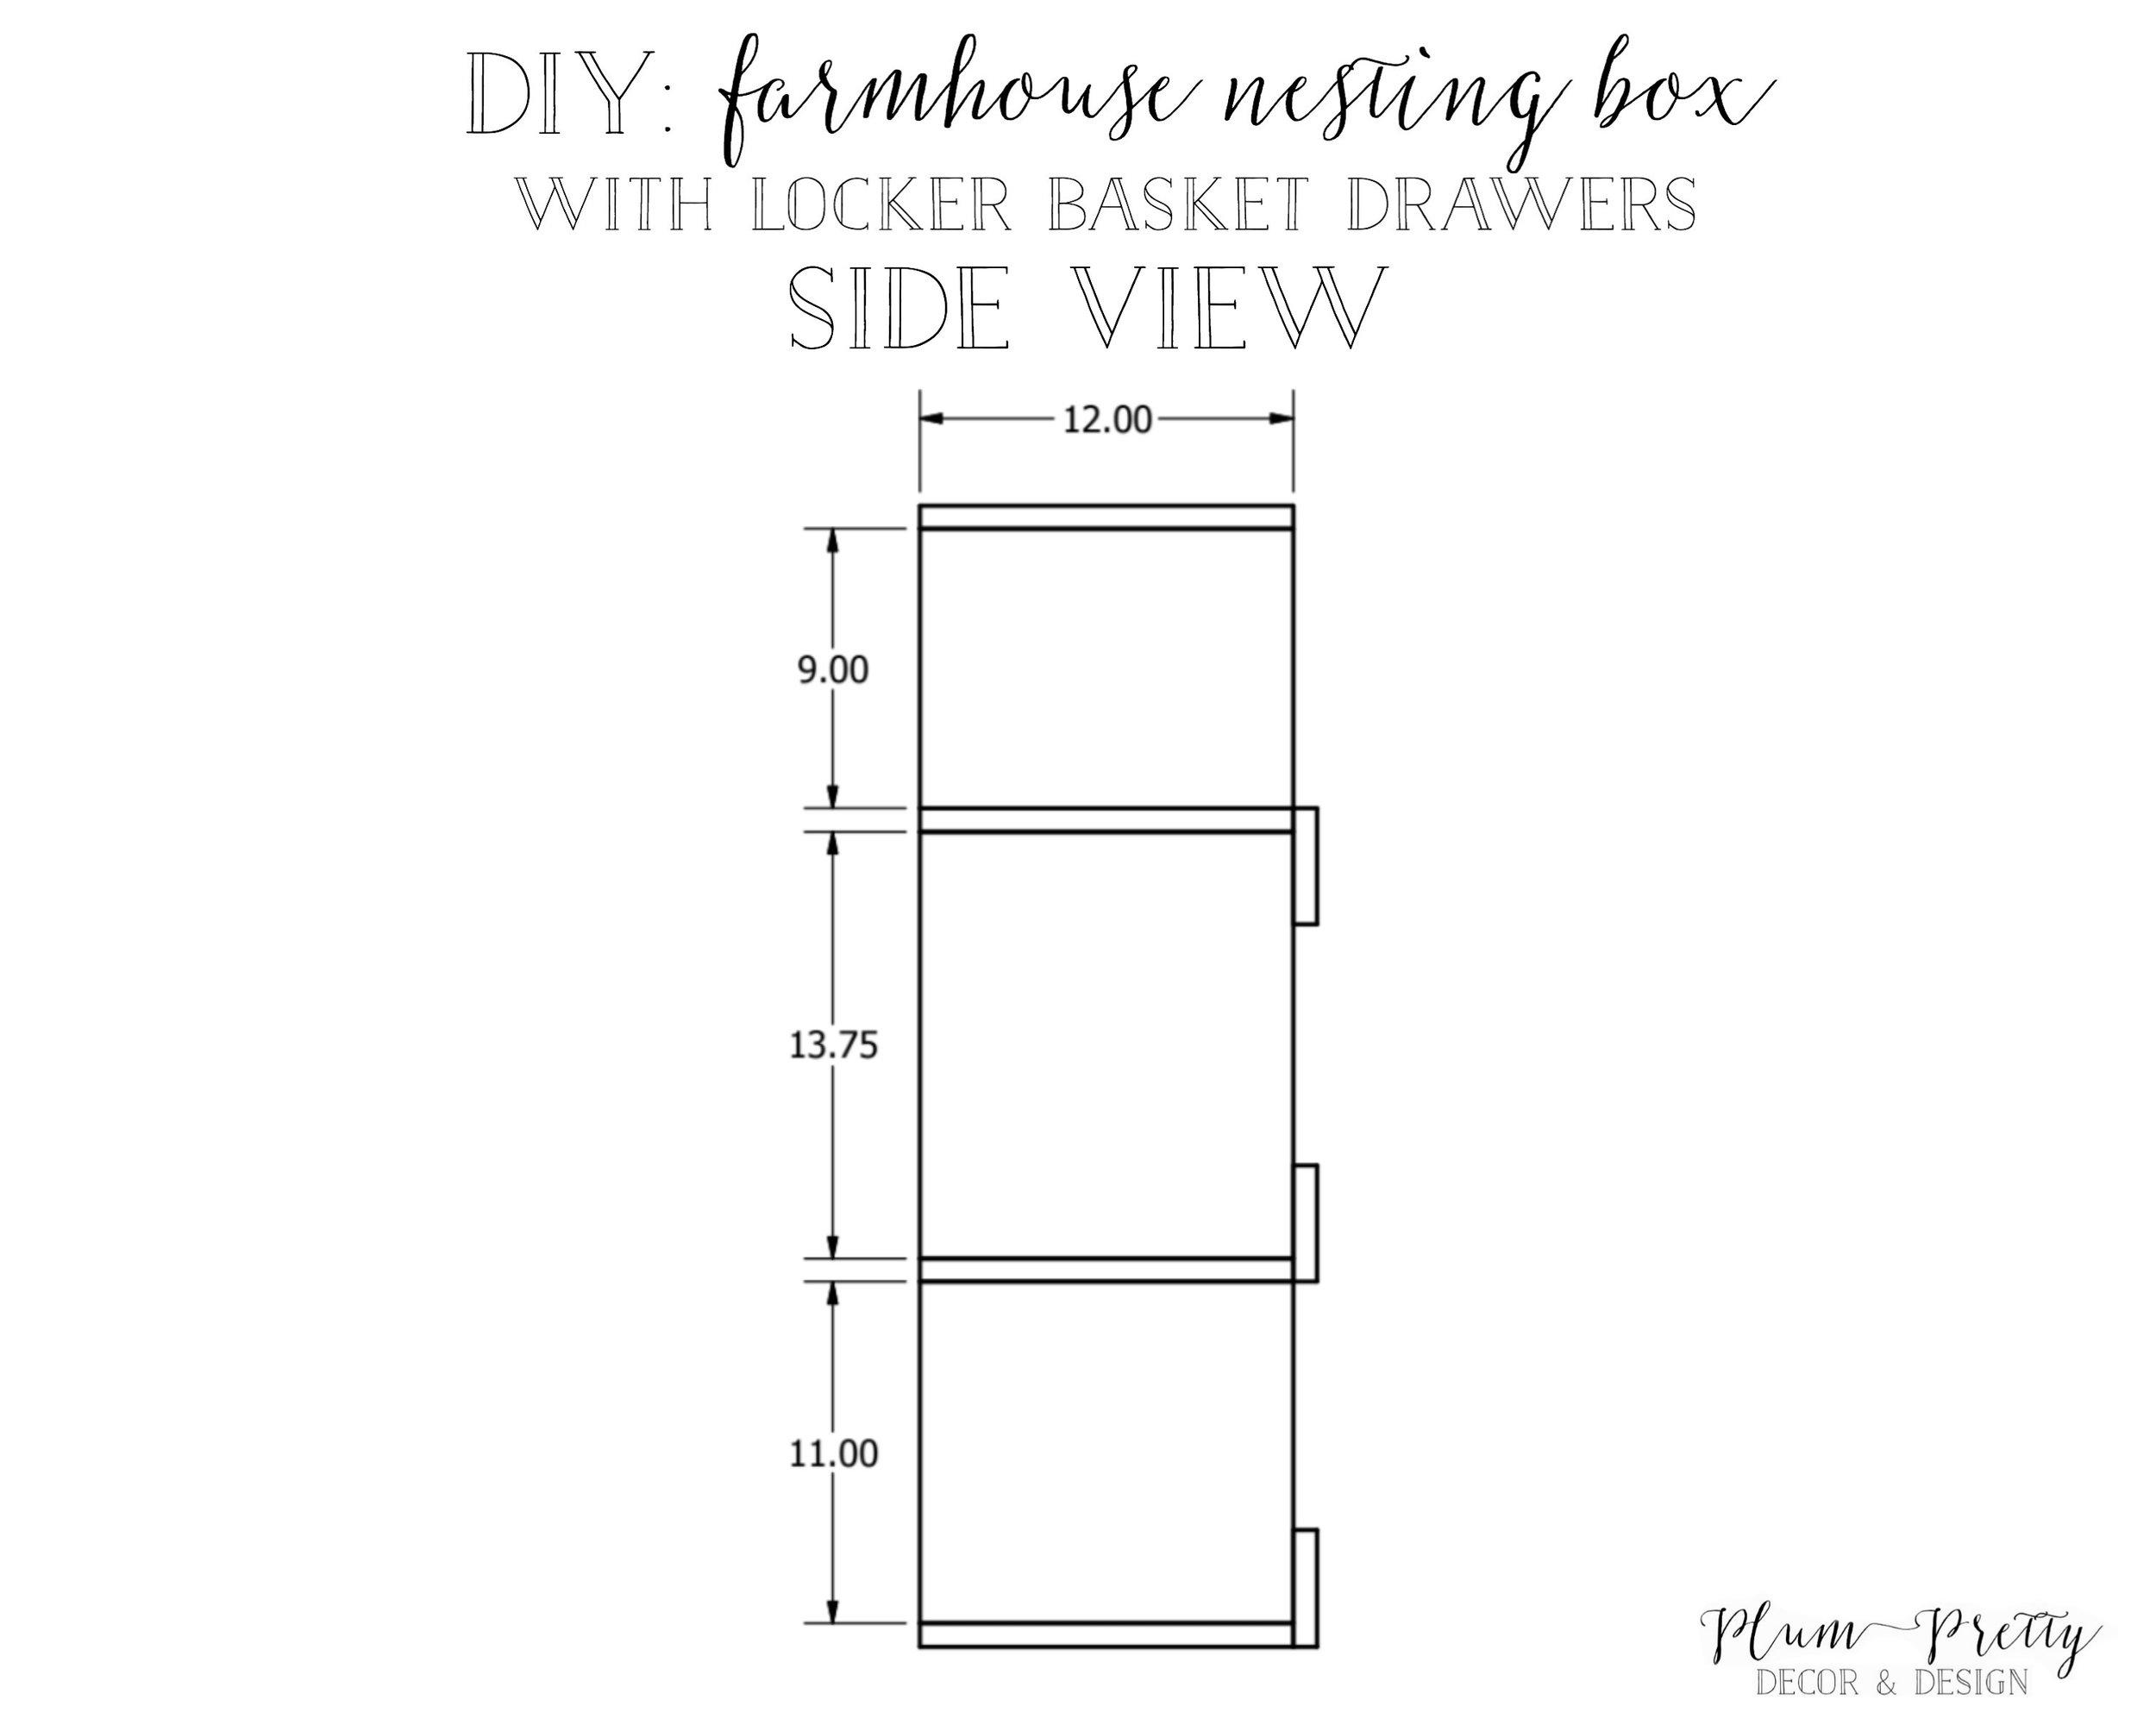 DIY: Farmhouse Nesting Box with Locker Basket Drawers Tutorial Side View by Plum Pretty Decor and Design